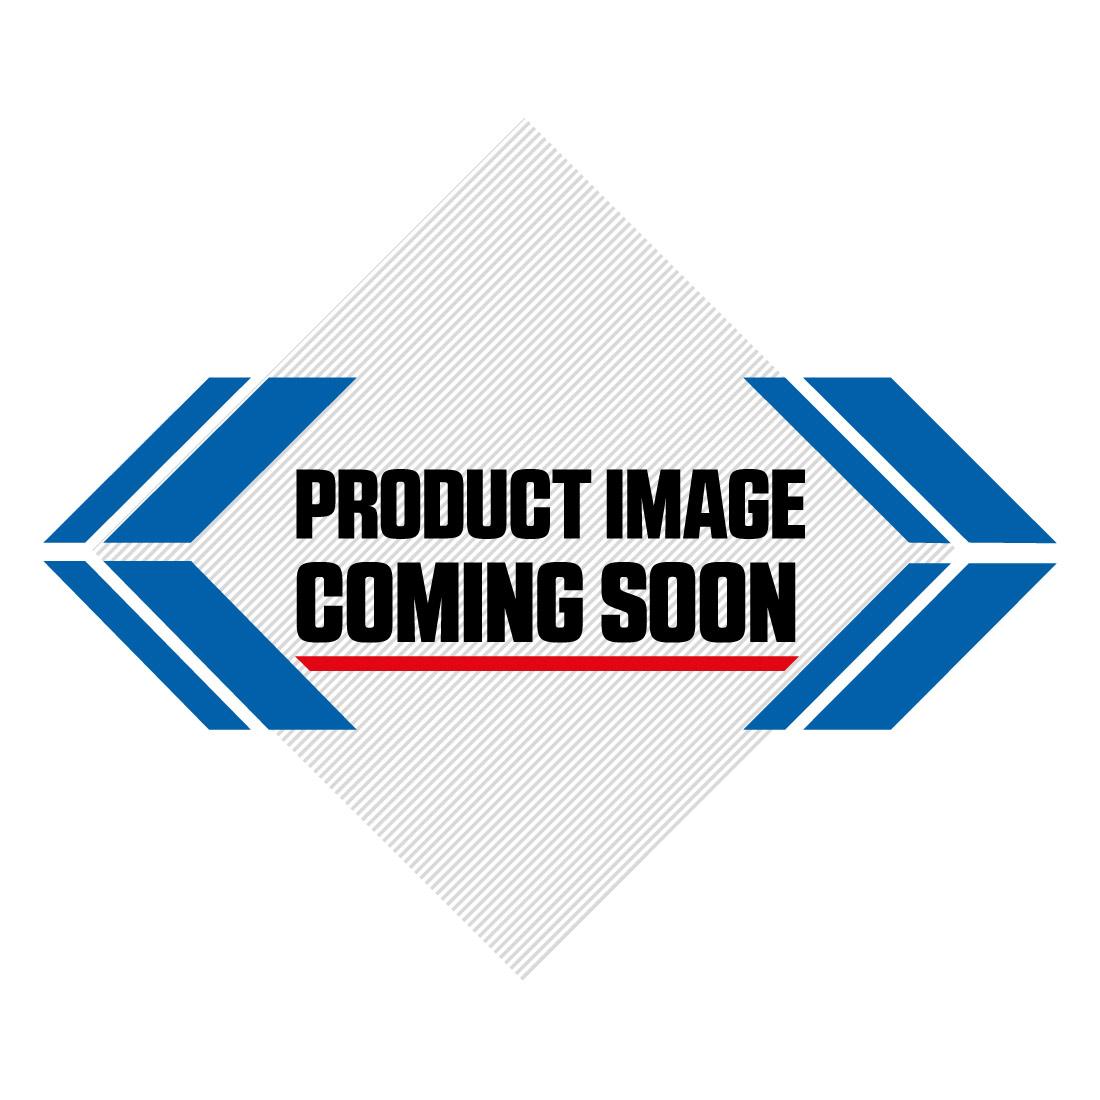 DJI Goggles - Immersive FPV Goggles Image-0